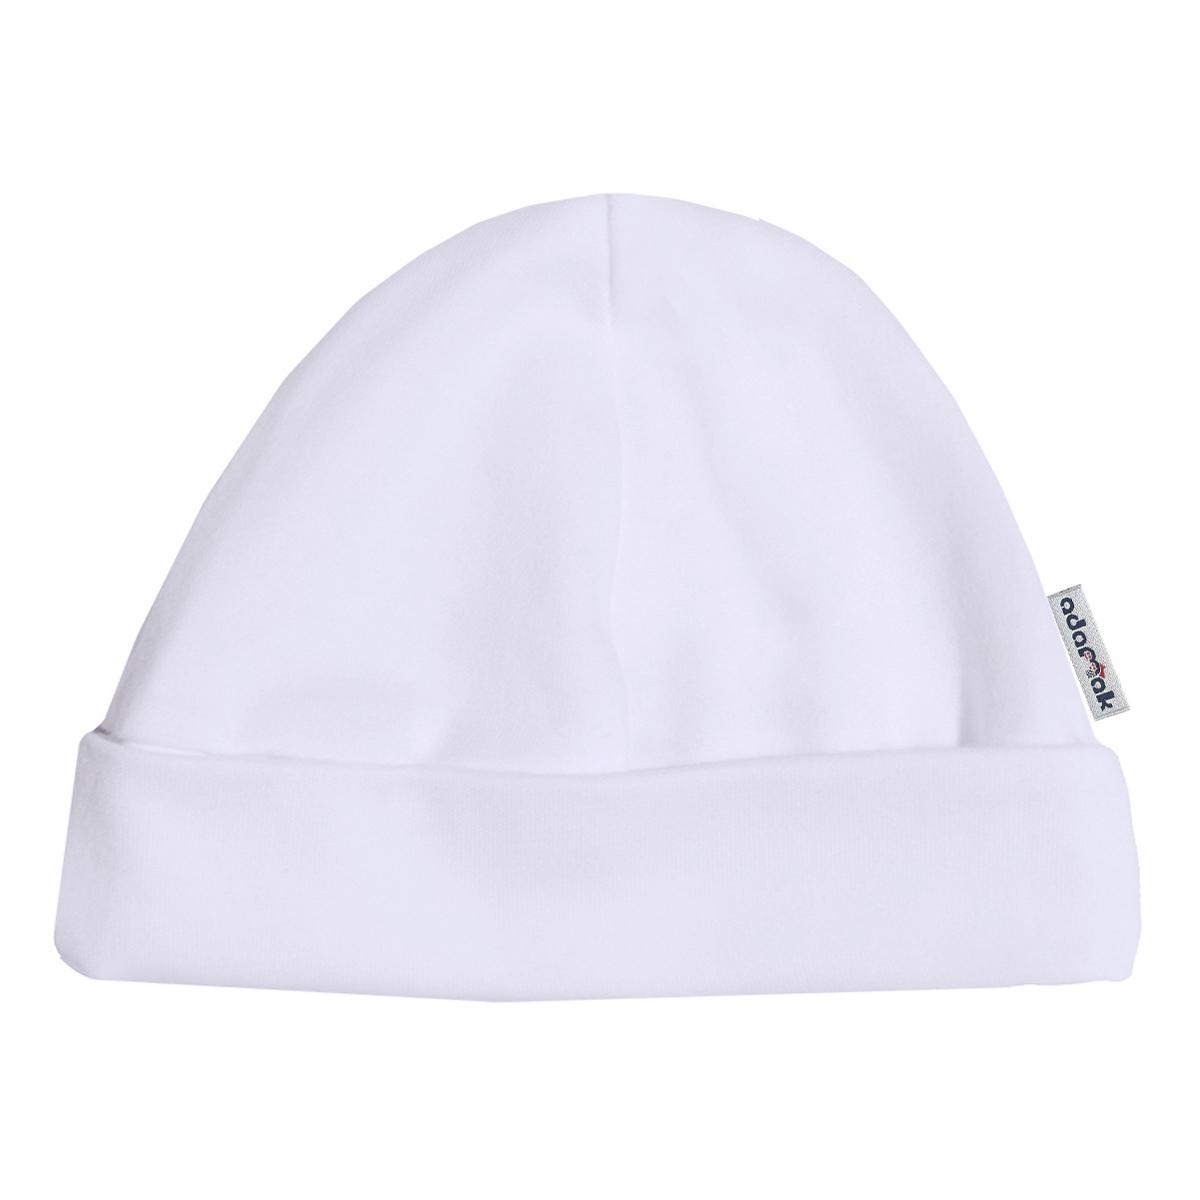 کلاه نوزادی آدمک مدل sun کد 03